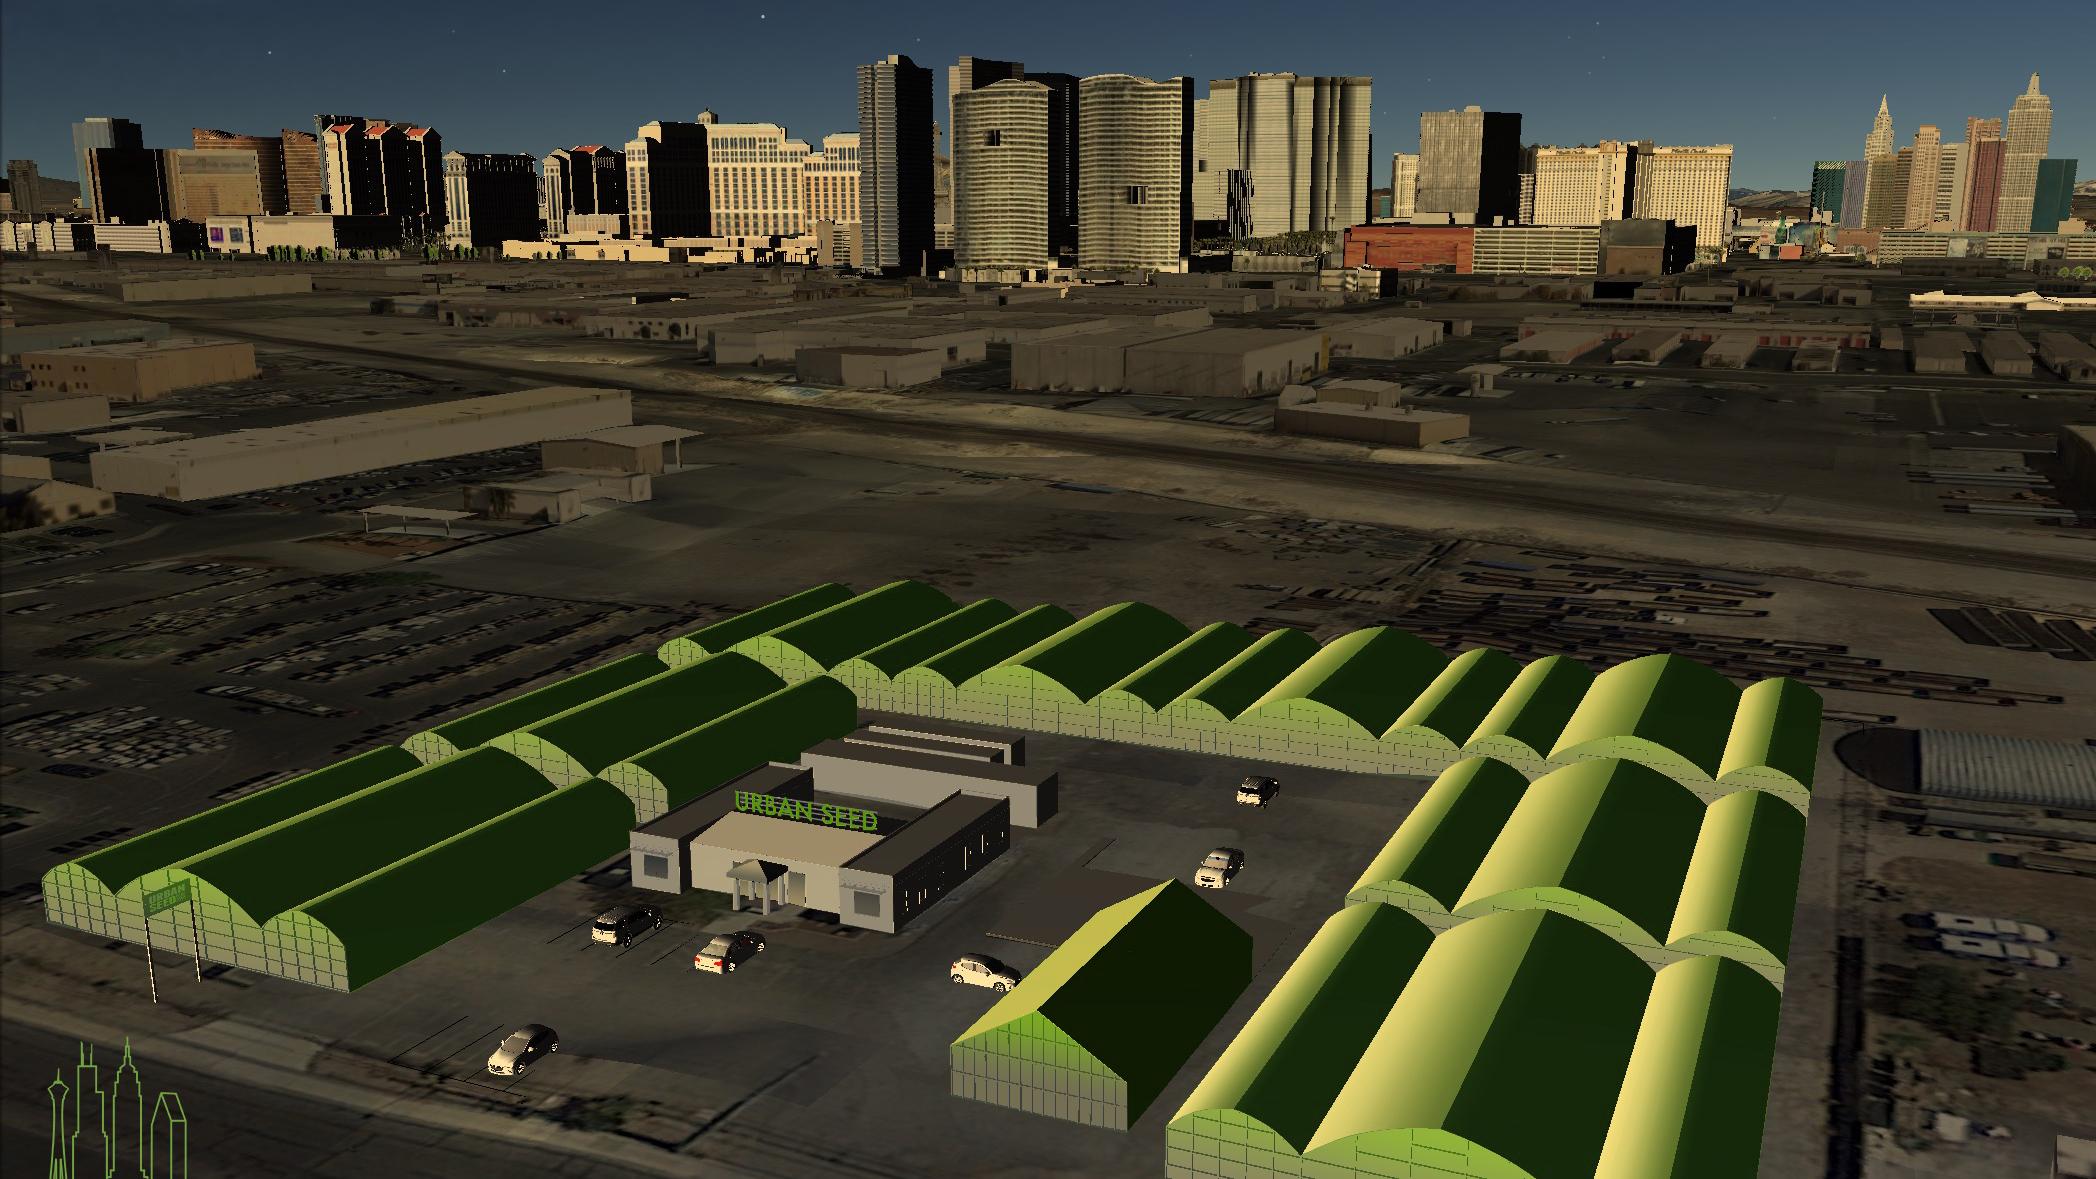 Farm Of The Future: What Grows In Las Vegas Stays In Las Vegas